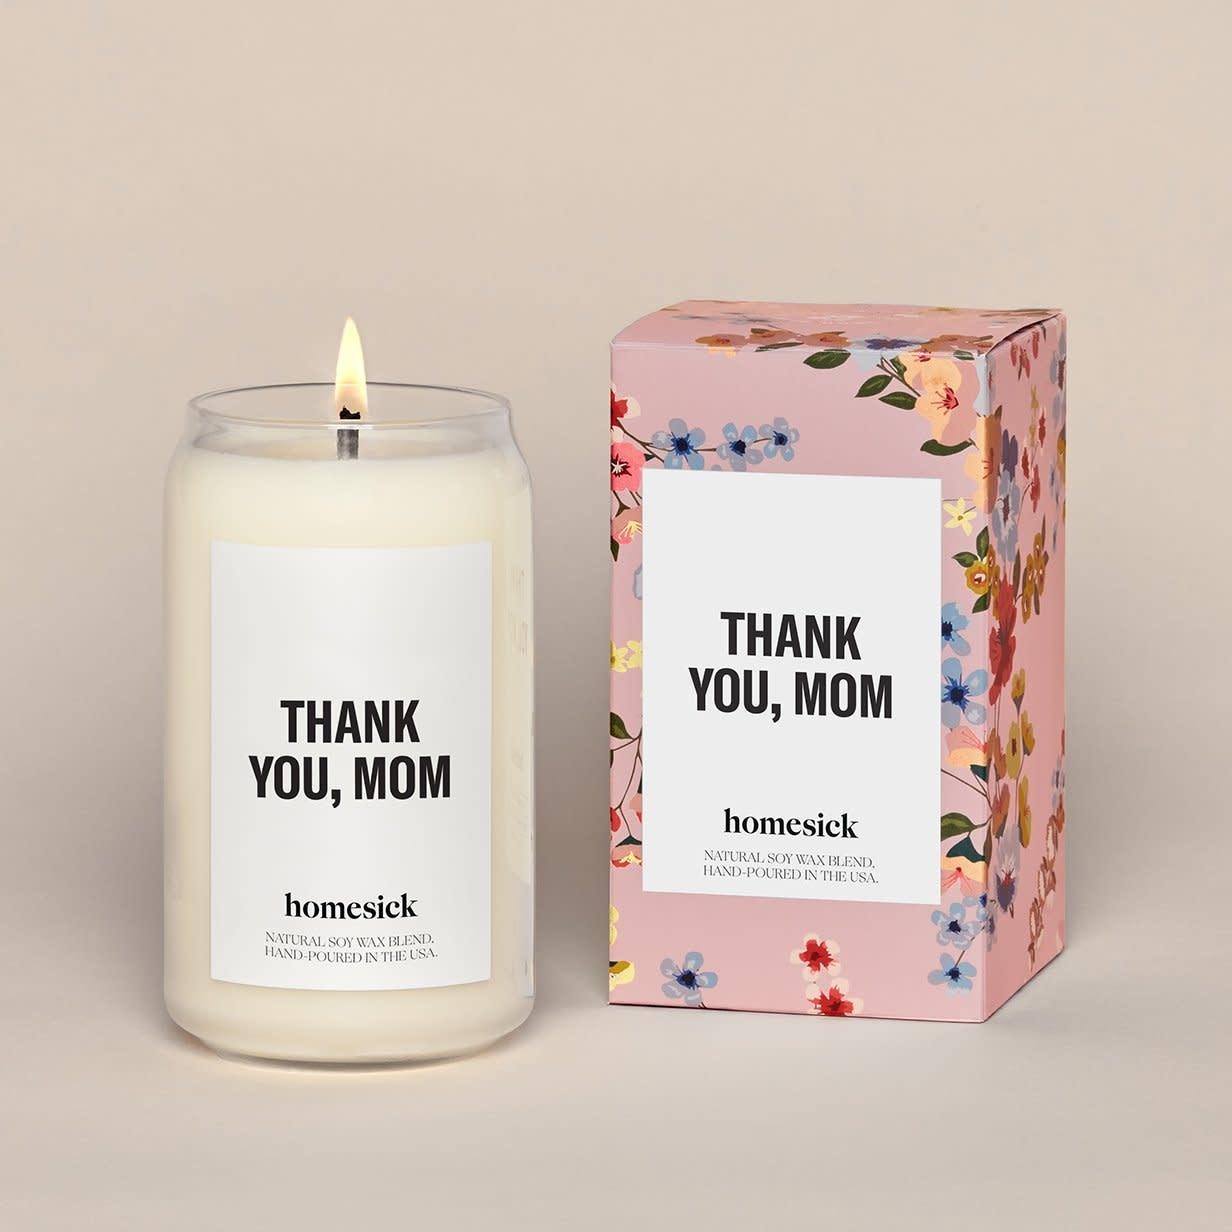 Homesick Thank You, Mom Candle